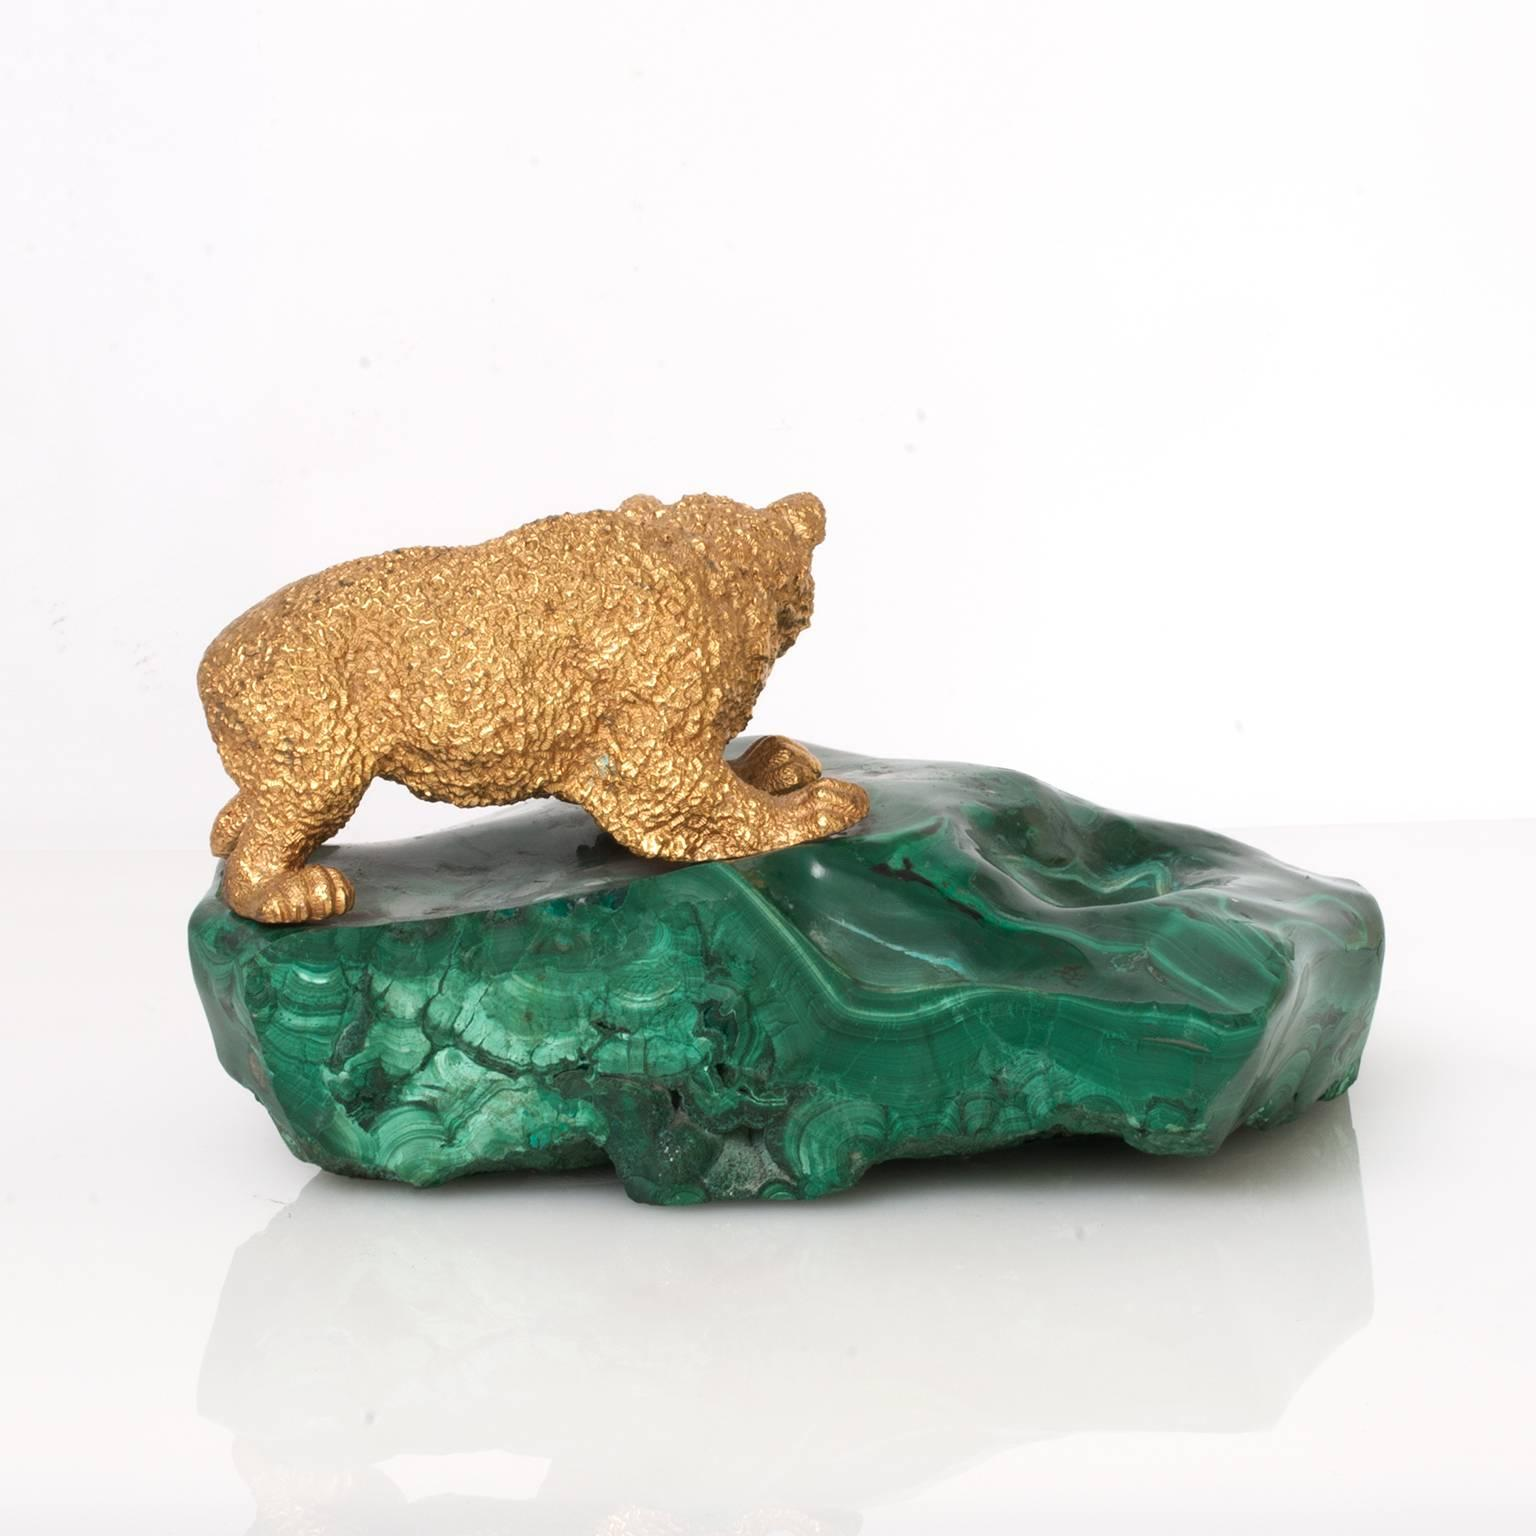 Russian Gilded Bronze Bear Cub Sculpture On A Sold Piece